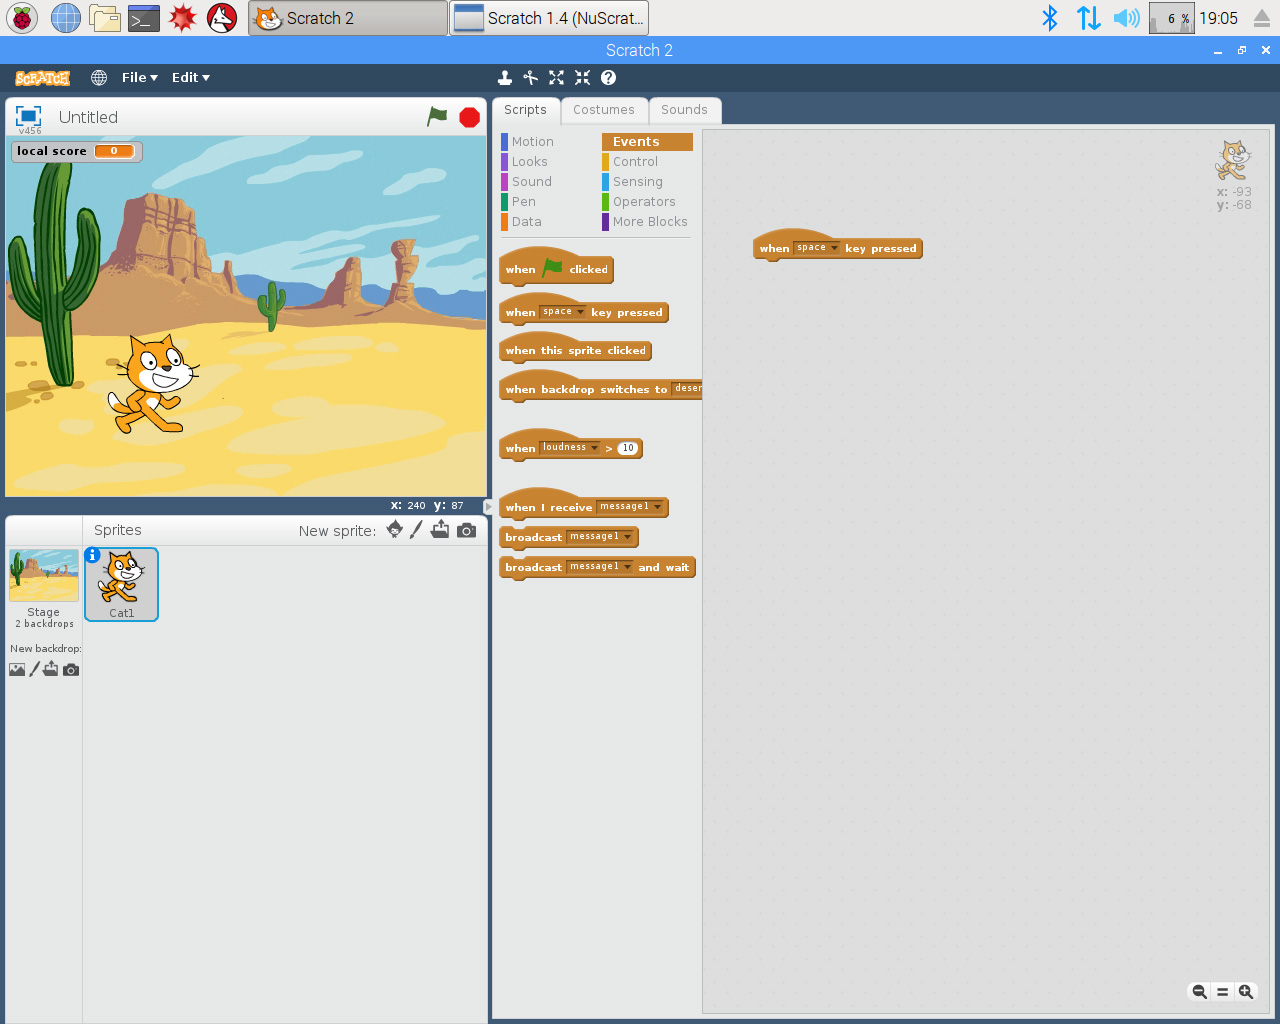 Scratch 2.0 for Raspberry Pi tutorial